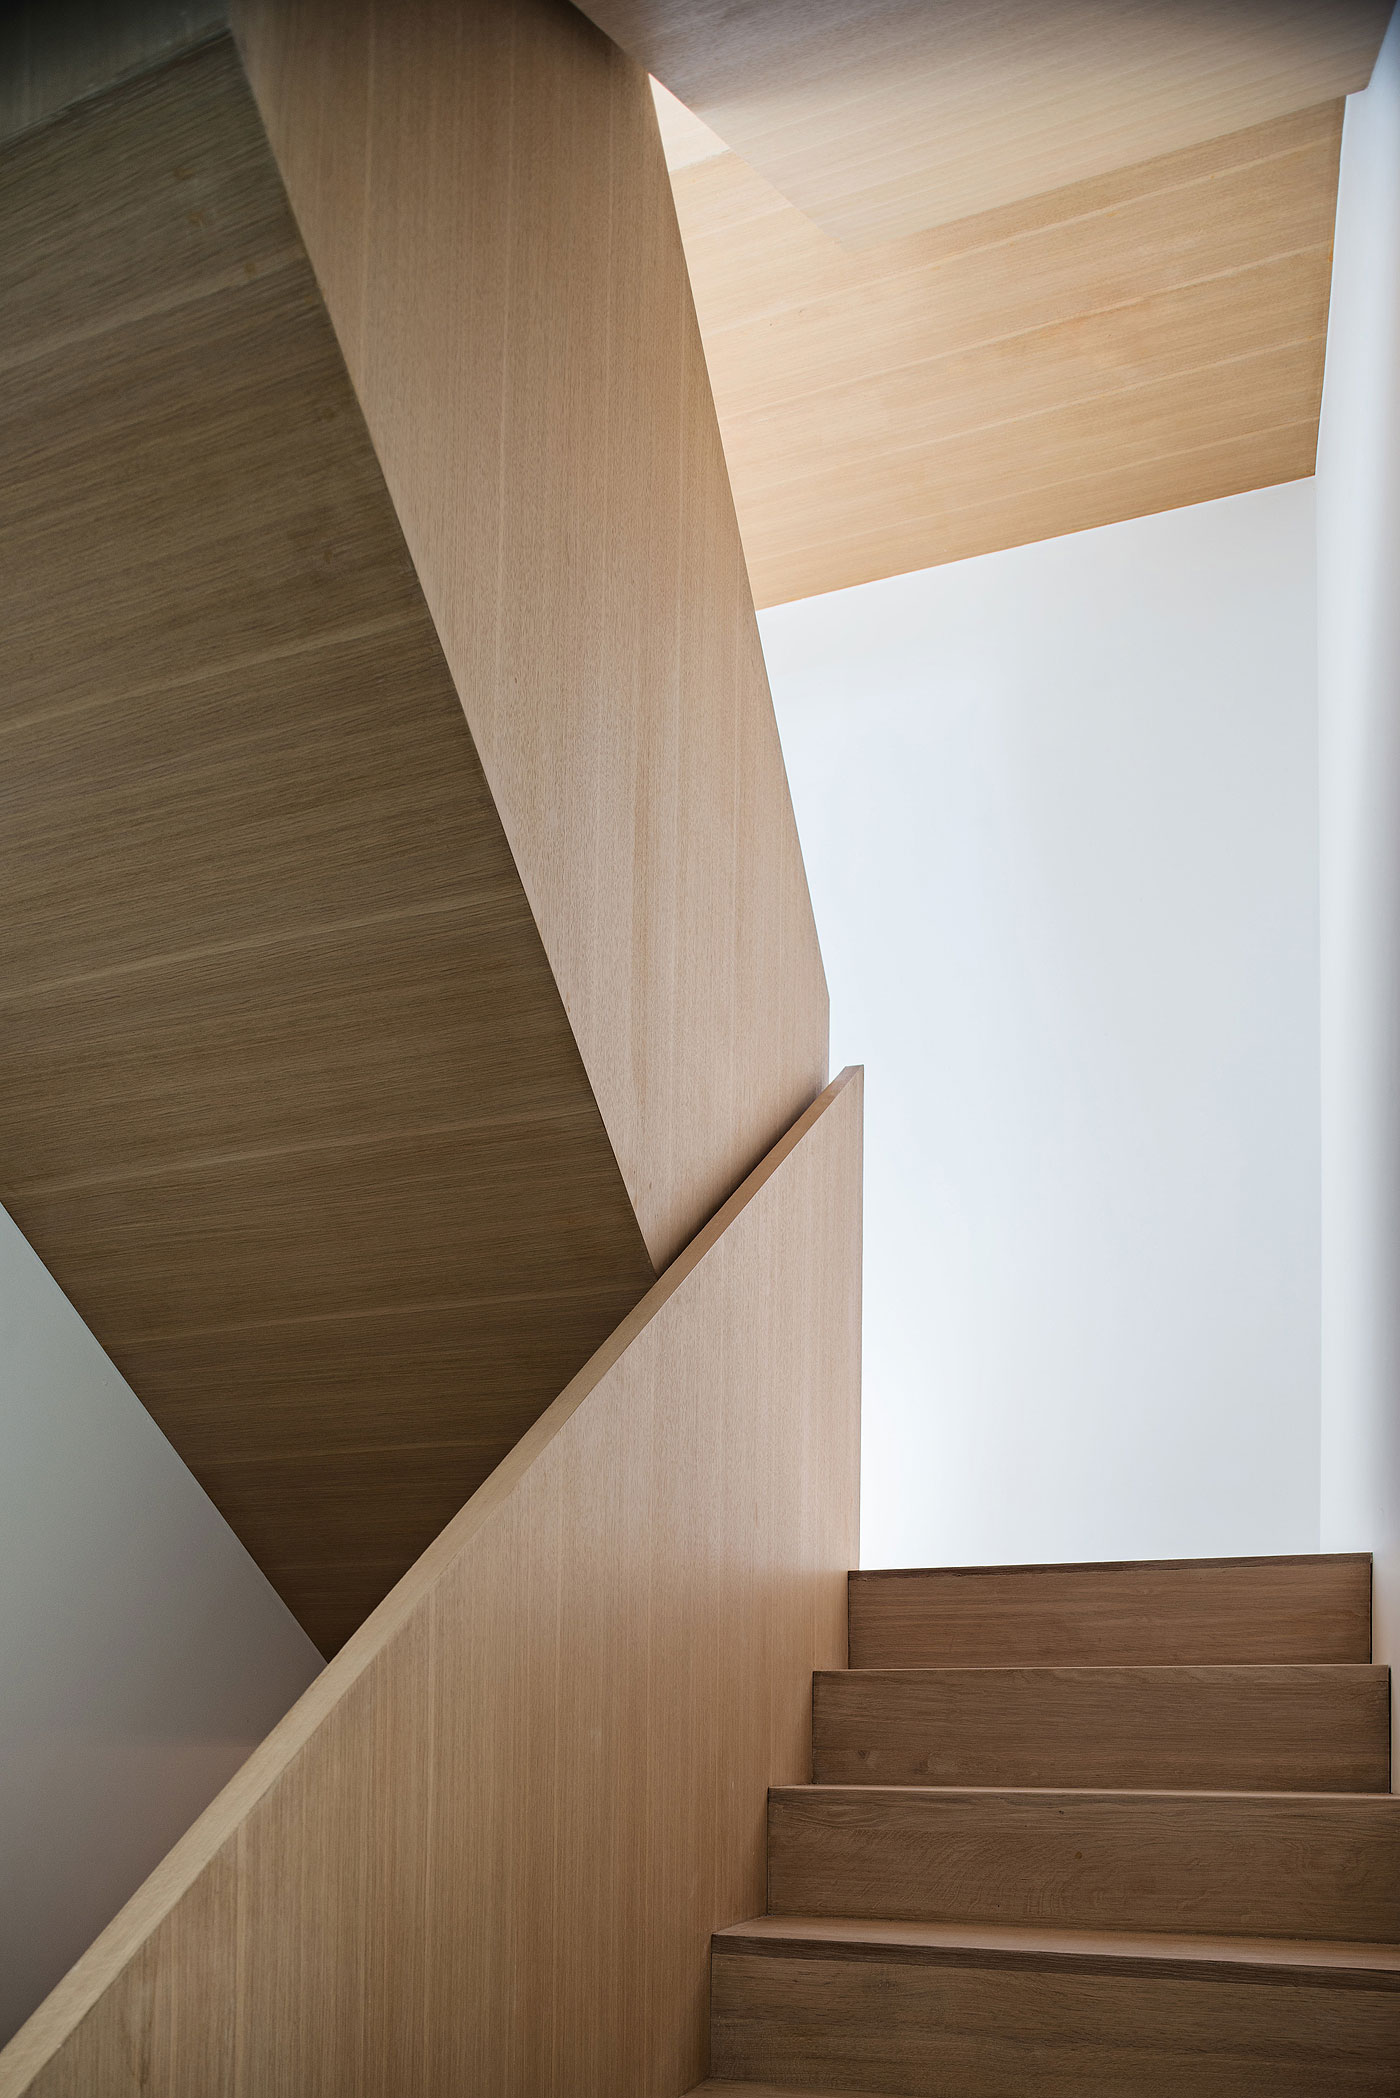 residencia-heathdale-tact-architecture-design (3)